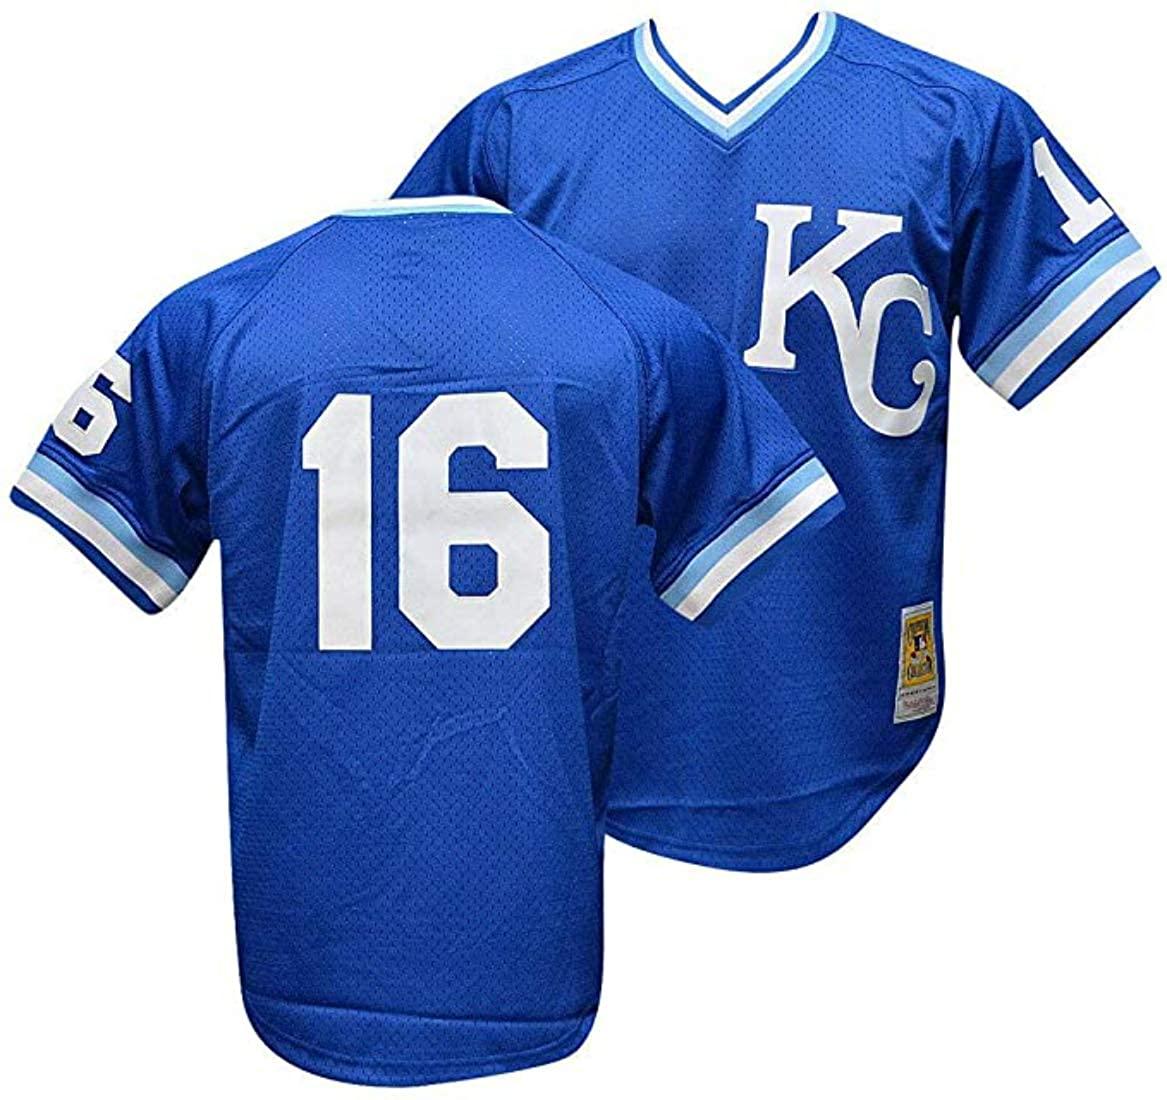 Bo Jackson #16 Kansas City Royals Men's 1989 Mesh Batting Practice Jersey Size X-Large XL Blue